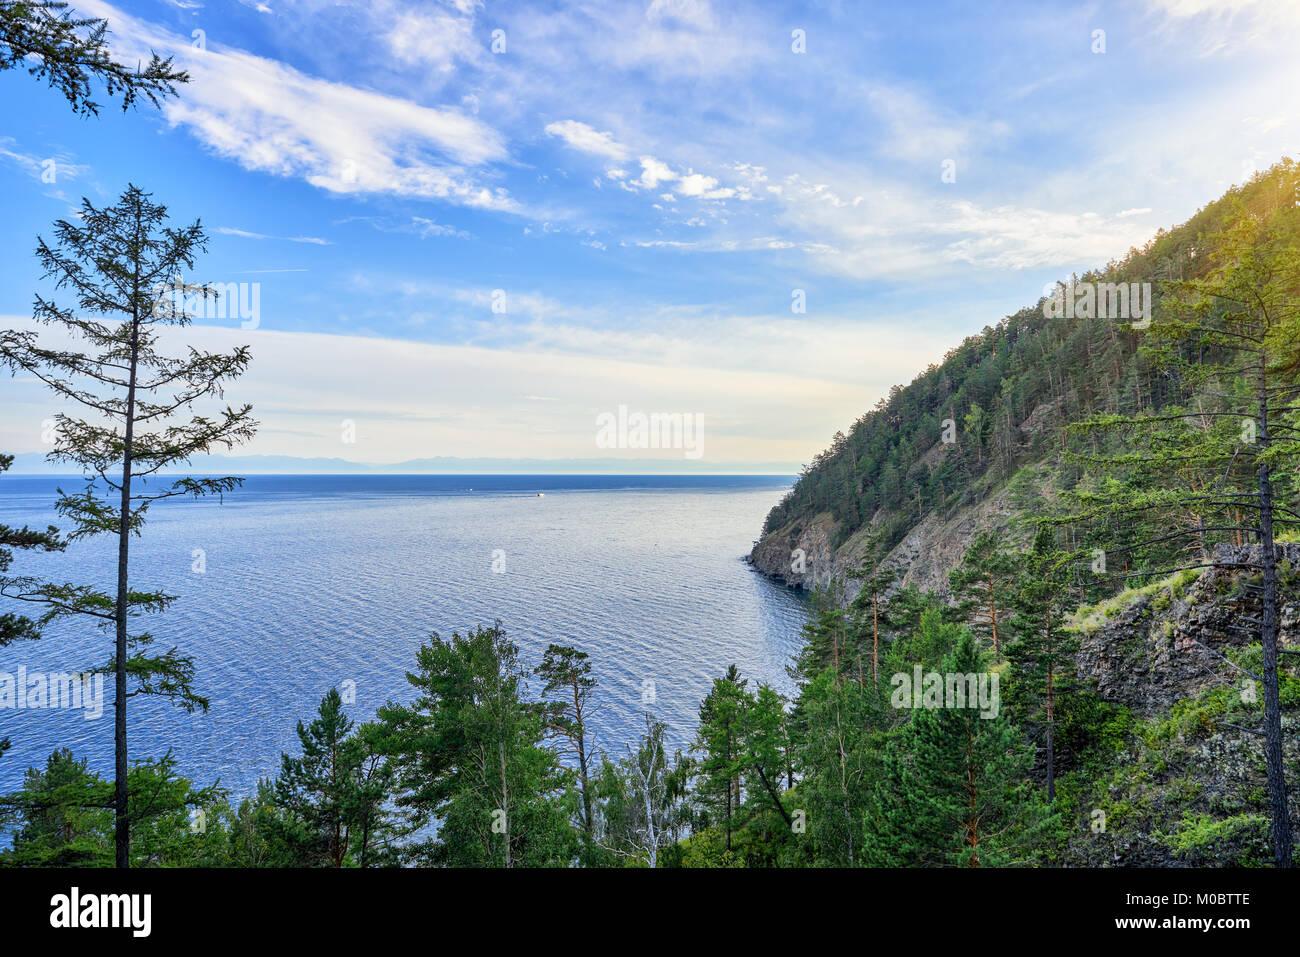 Lake Baikal is located near Irkutsk 24